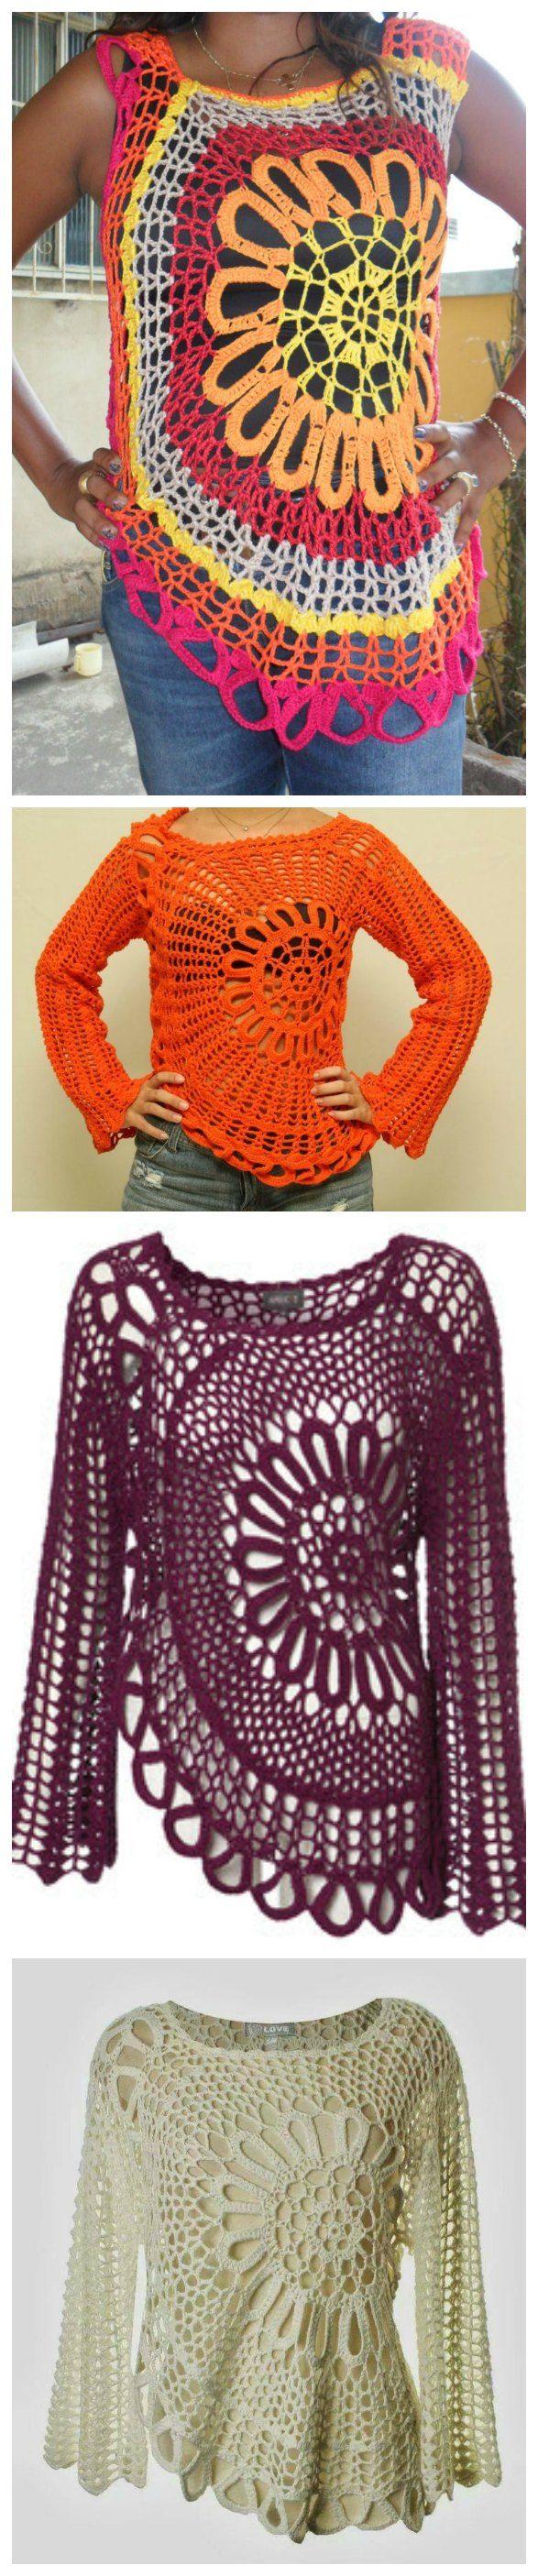 Crochet Stylish Blouse | crochet | Pinterest | Pullover häkelmuster ...